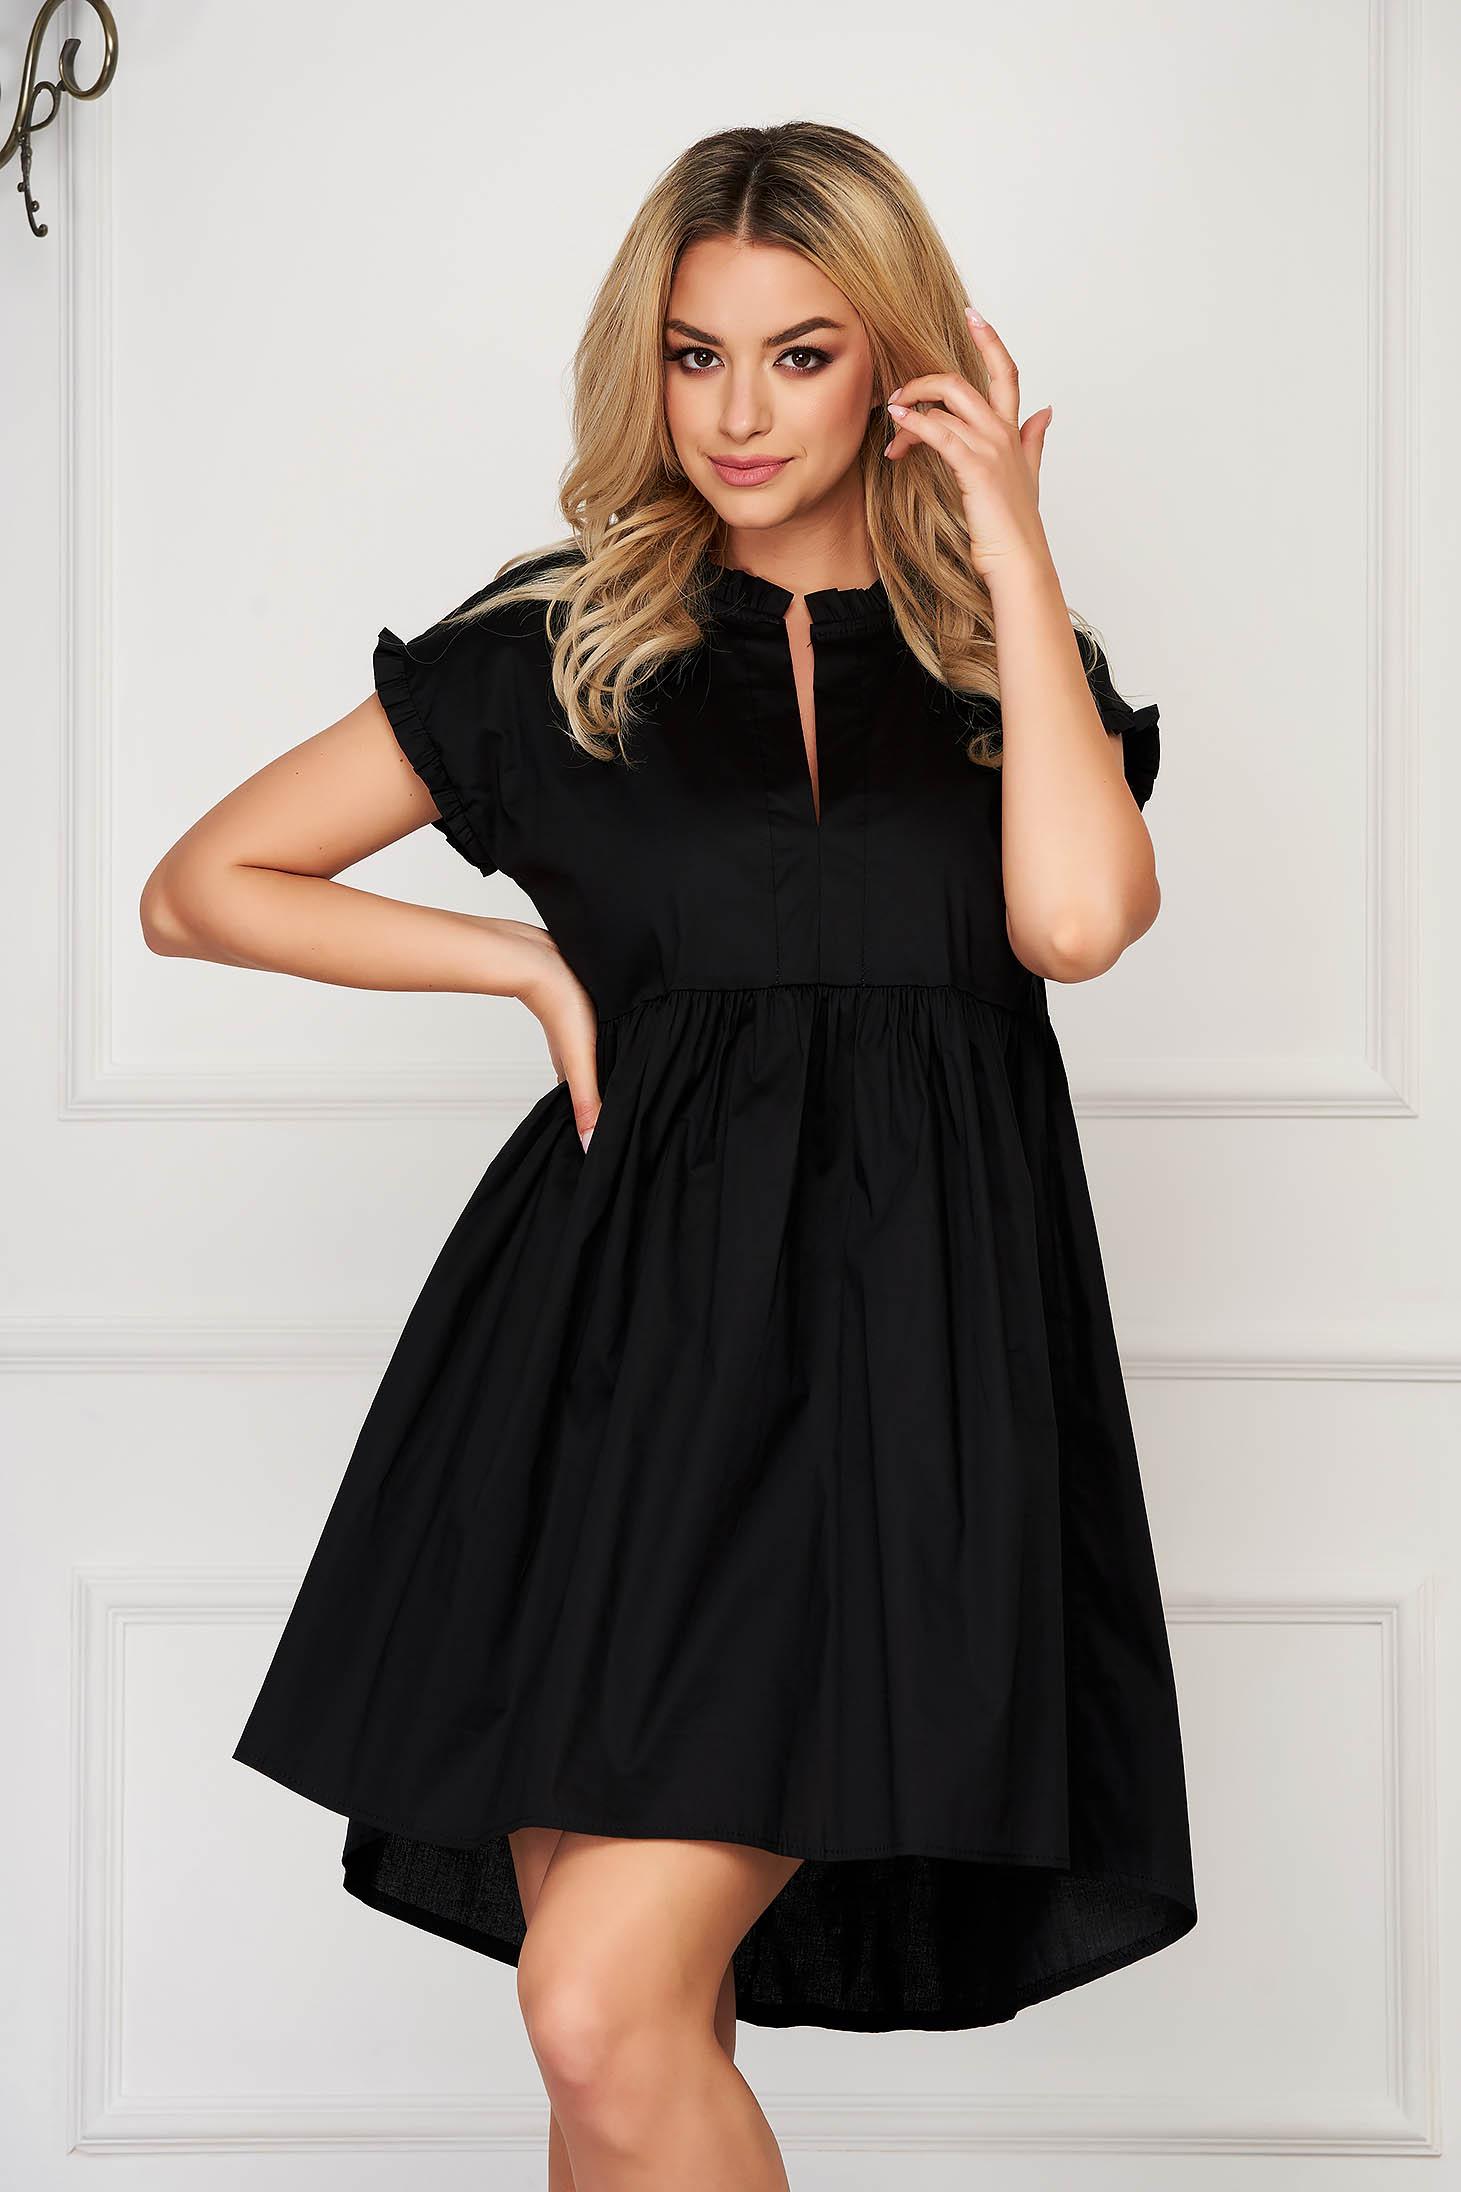 Black casual midi dress poplin, thin cotton asymmetrical short sleeves